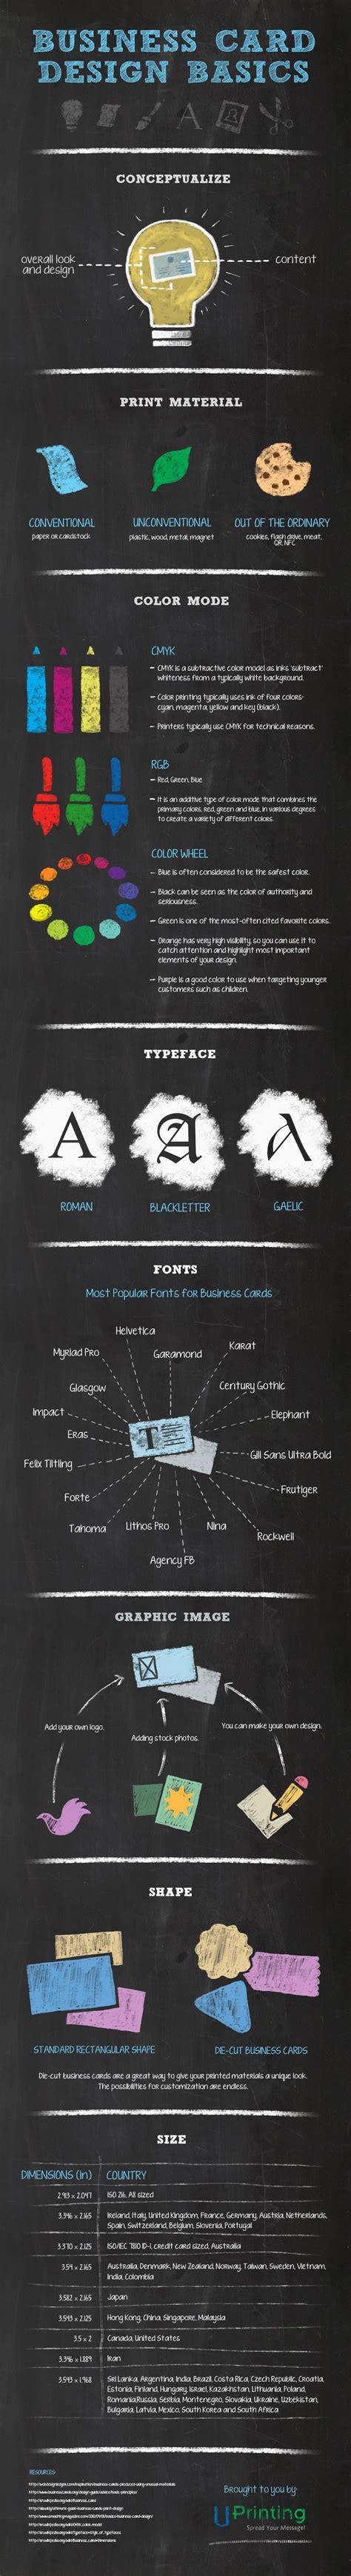 Business Card Design Basics